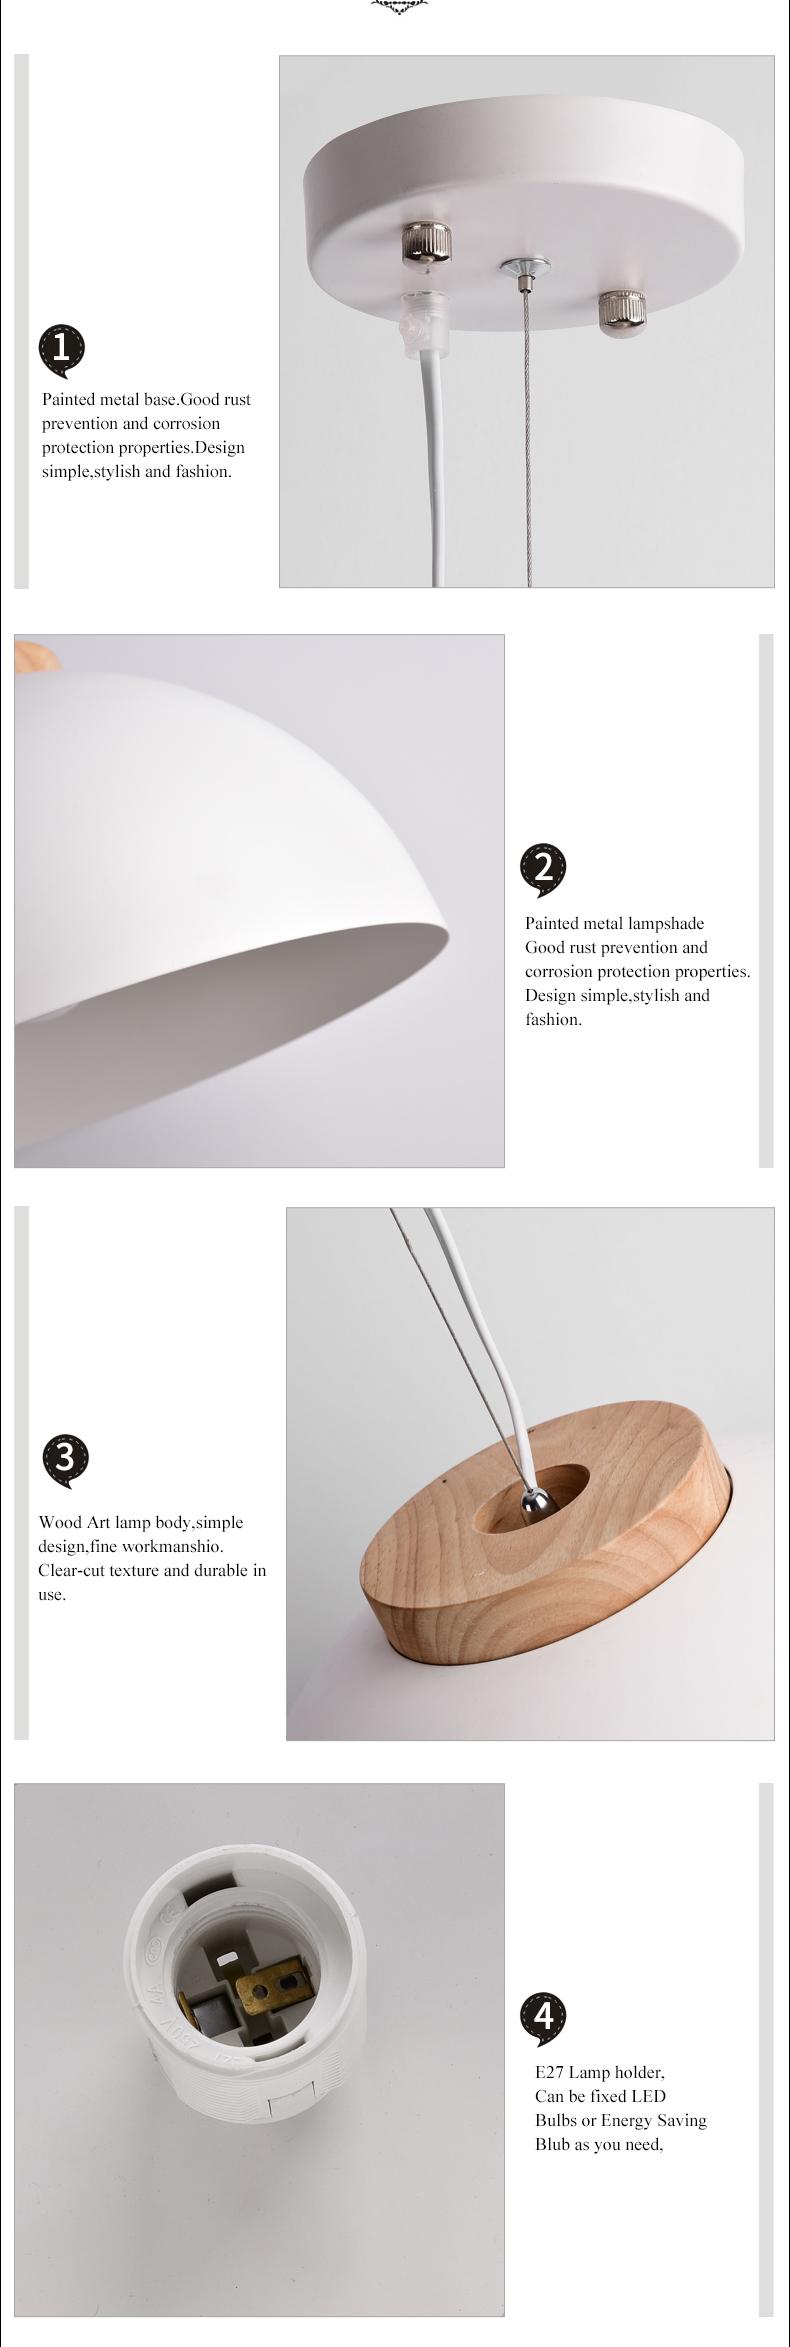 BOTIMI Mushi 人気 ホワイト木製ダイニング軽金属ランプシェード吊りランプ鉄サスペンション照明 5